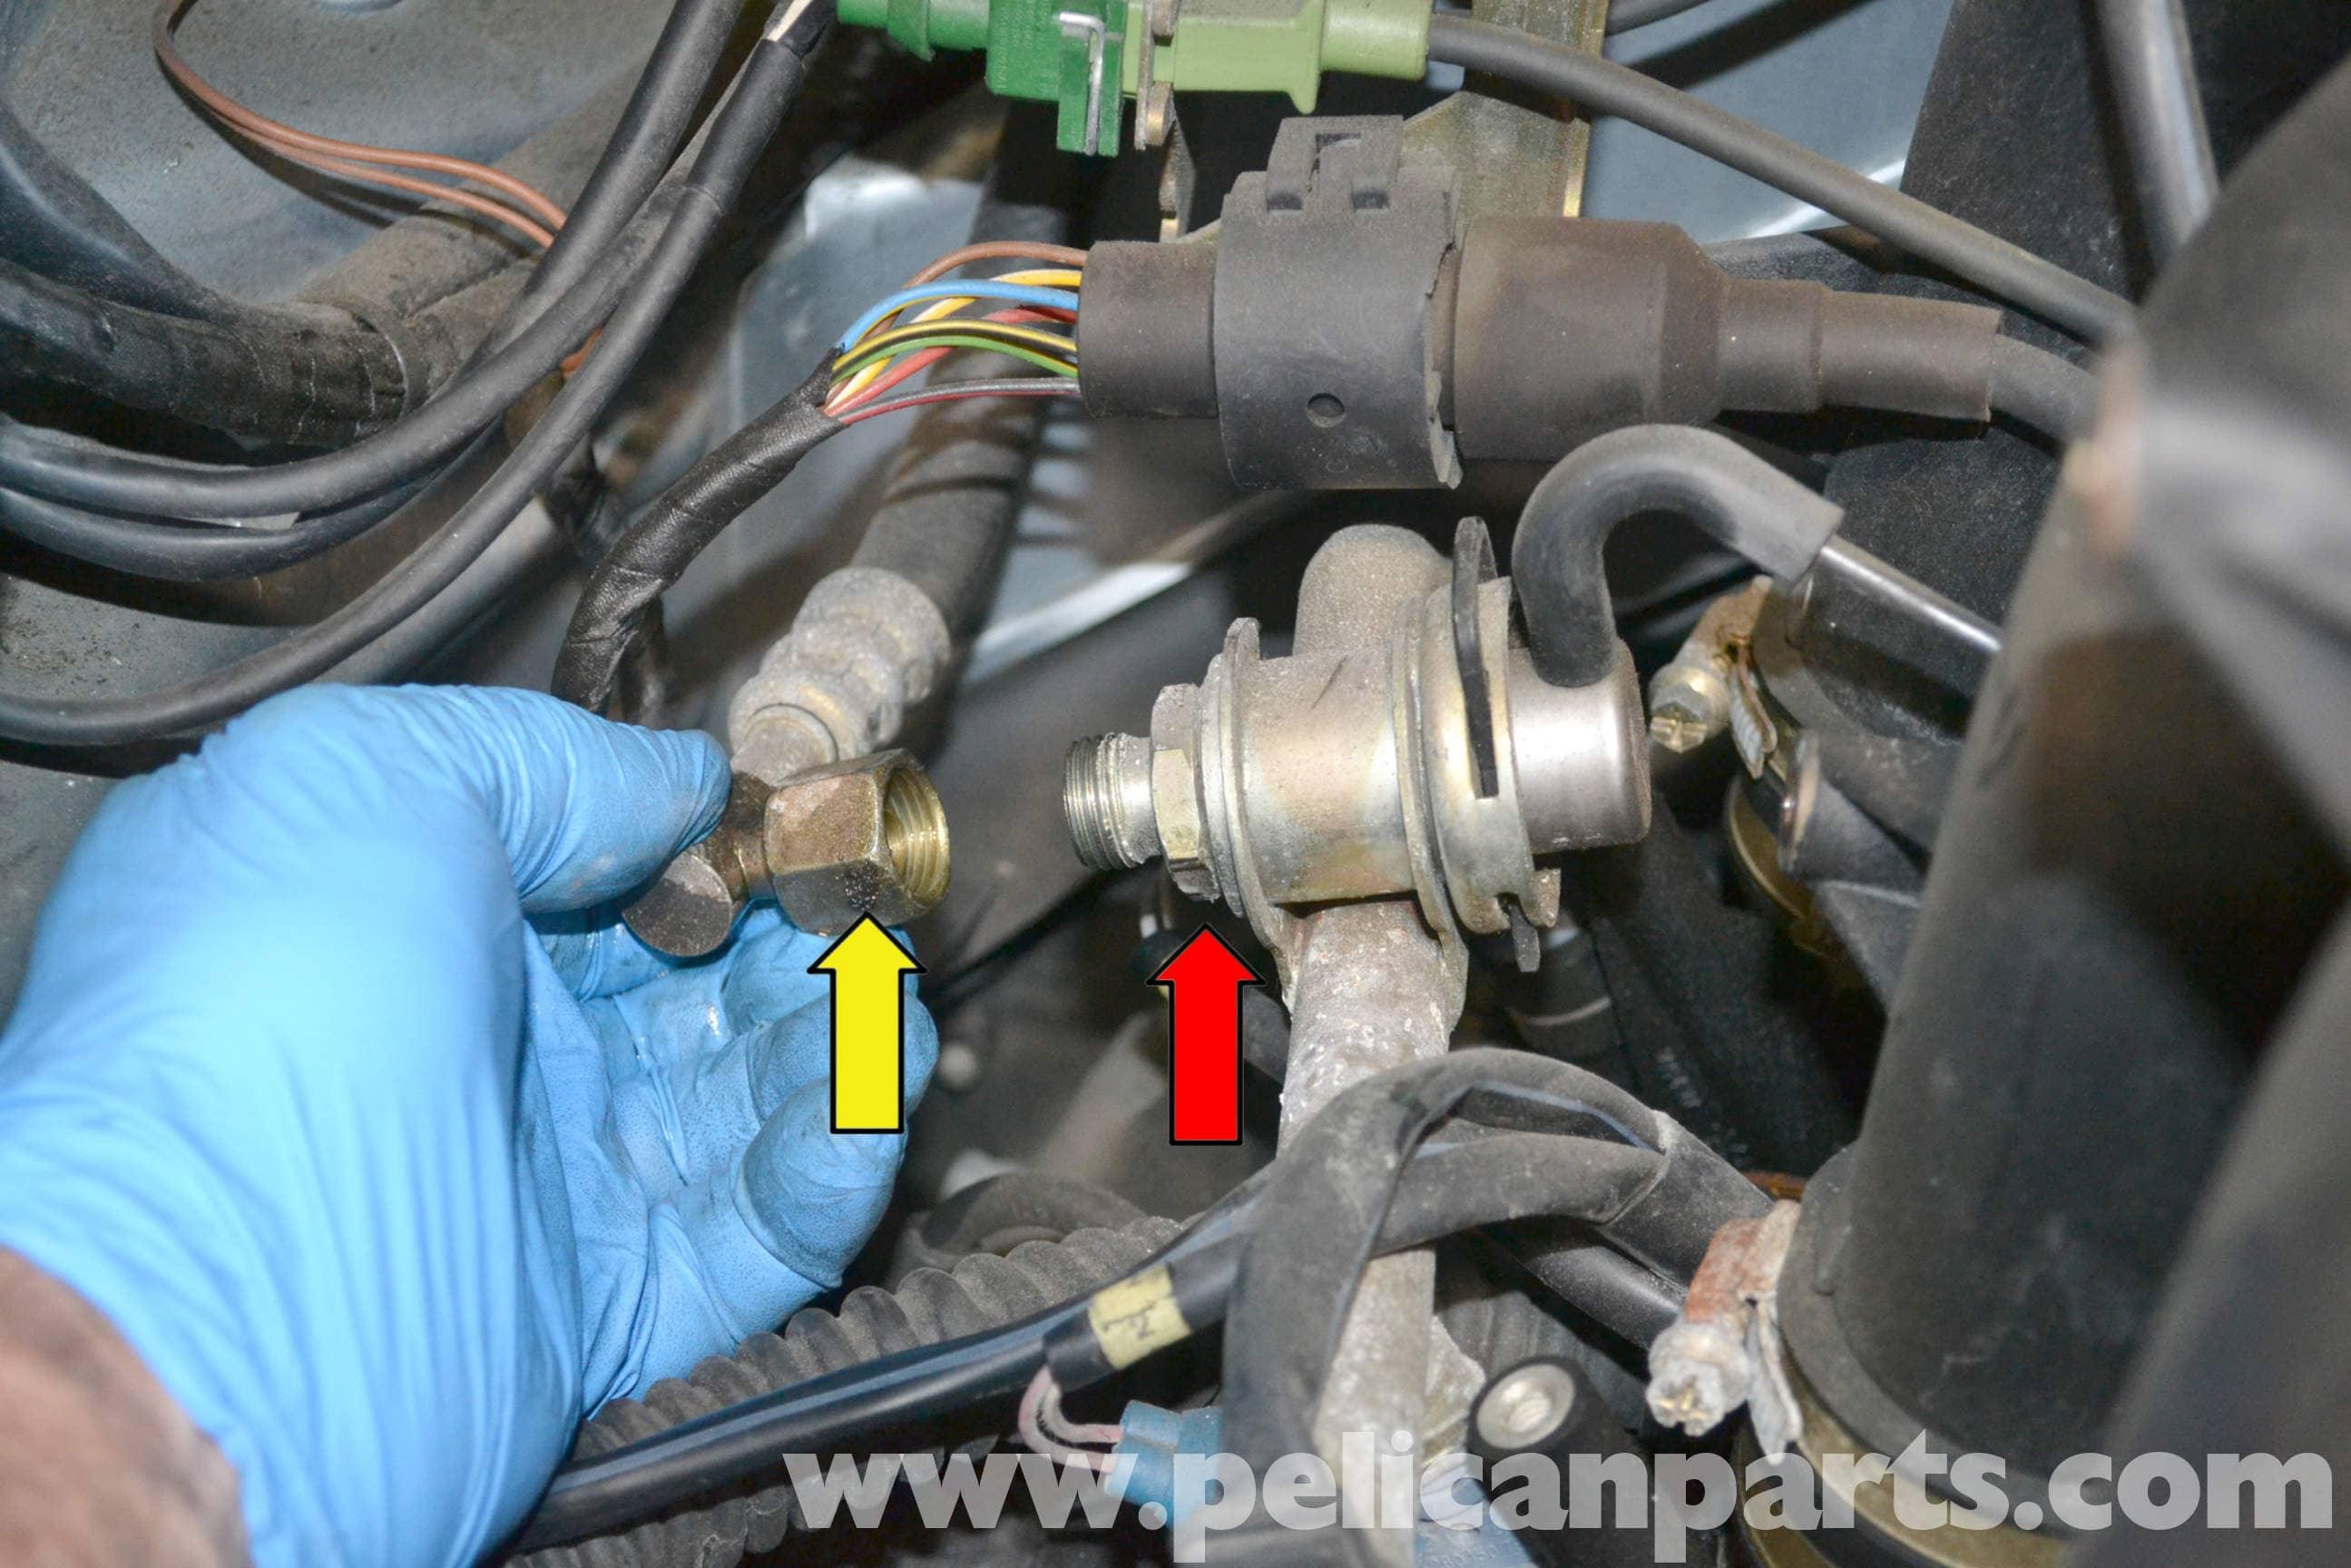 Pelican Parts Technical Article - Porsche 993 - Fuel